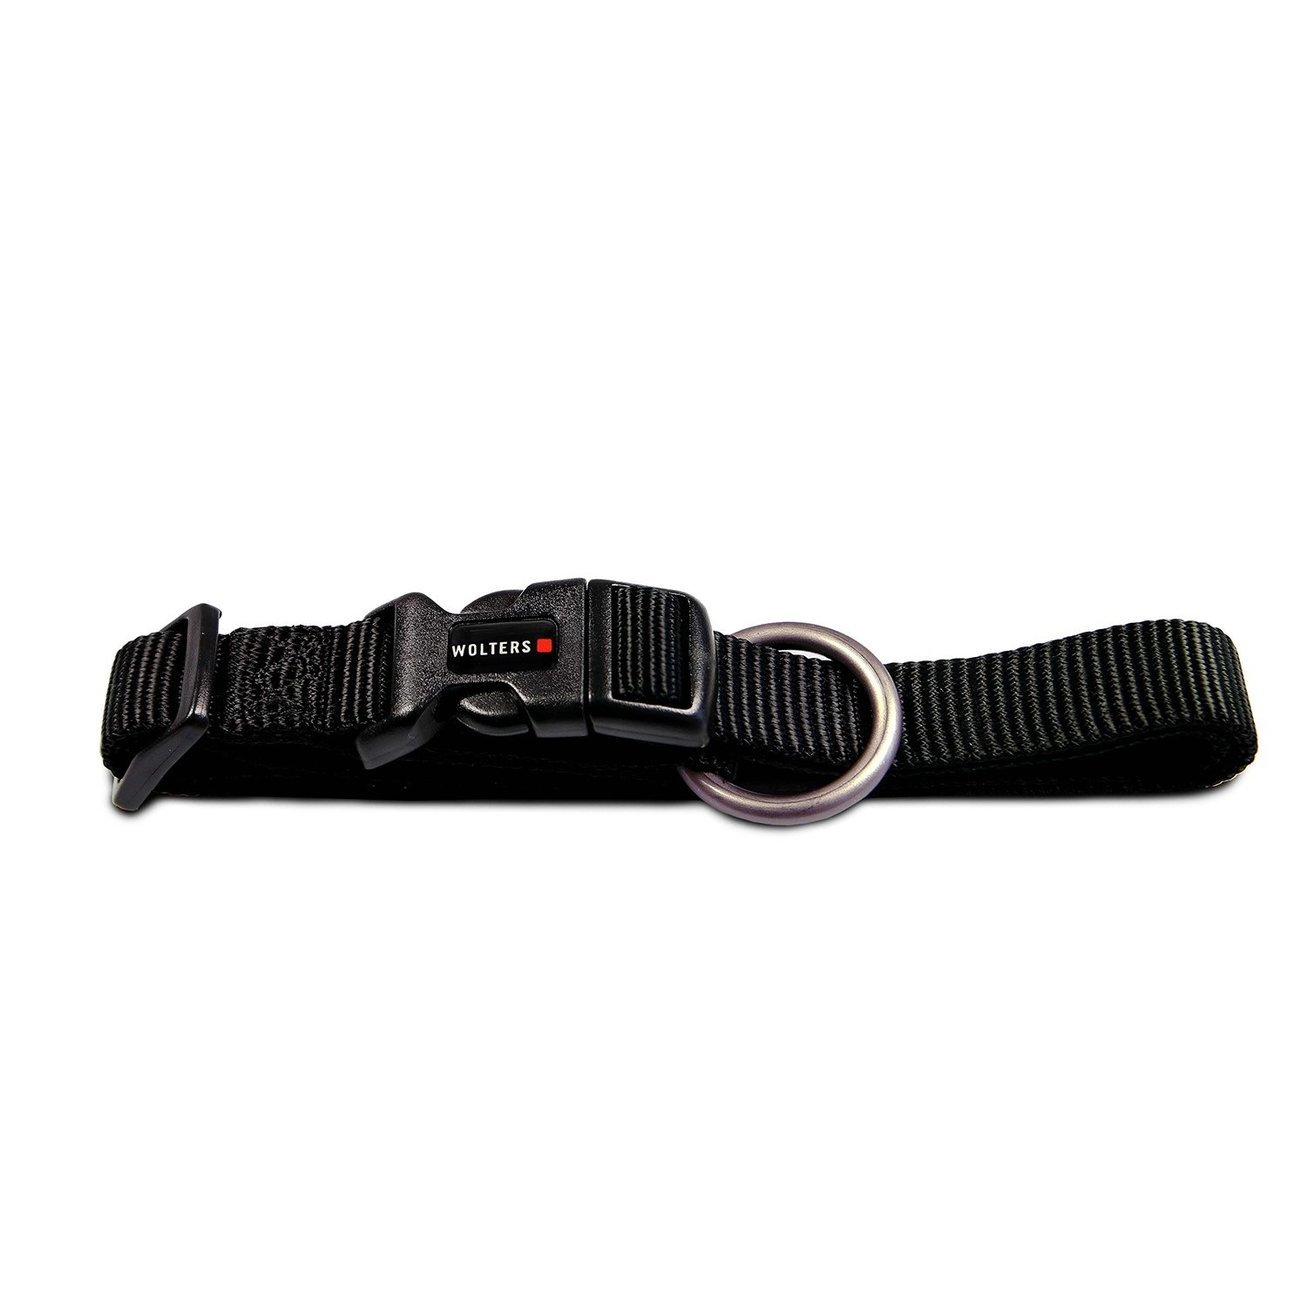 Wolters Halsband Nylon Professional, Bild 13